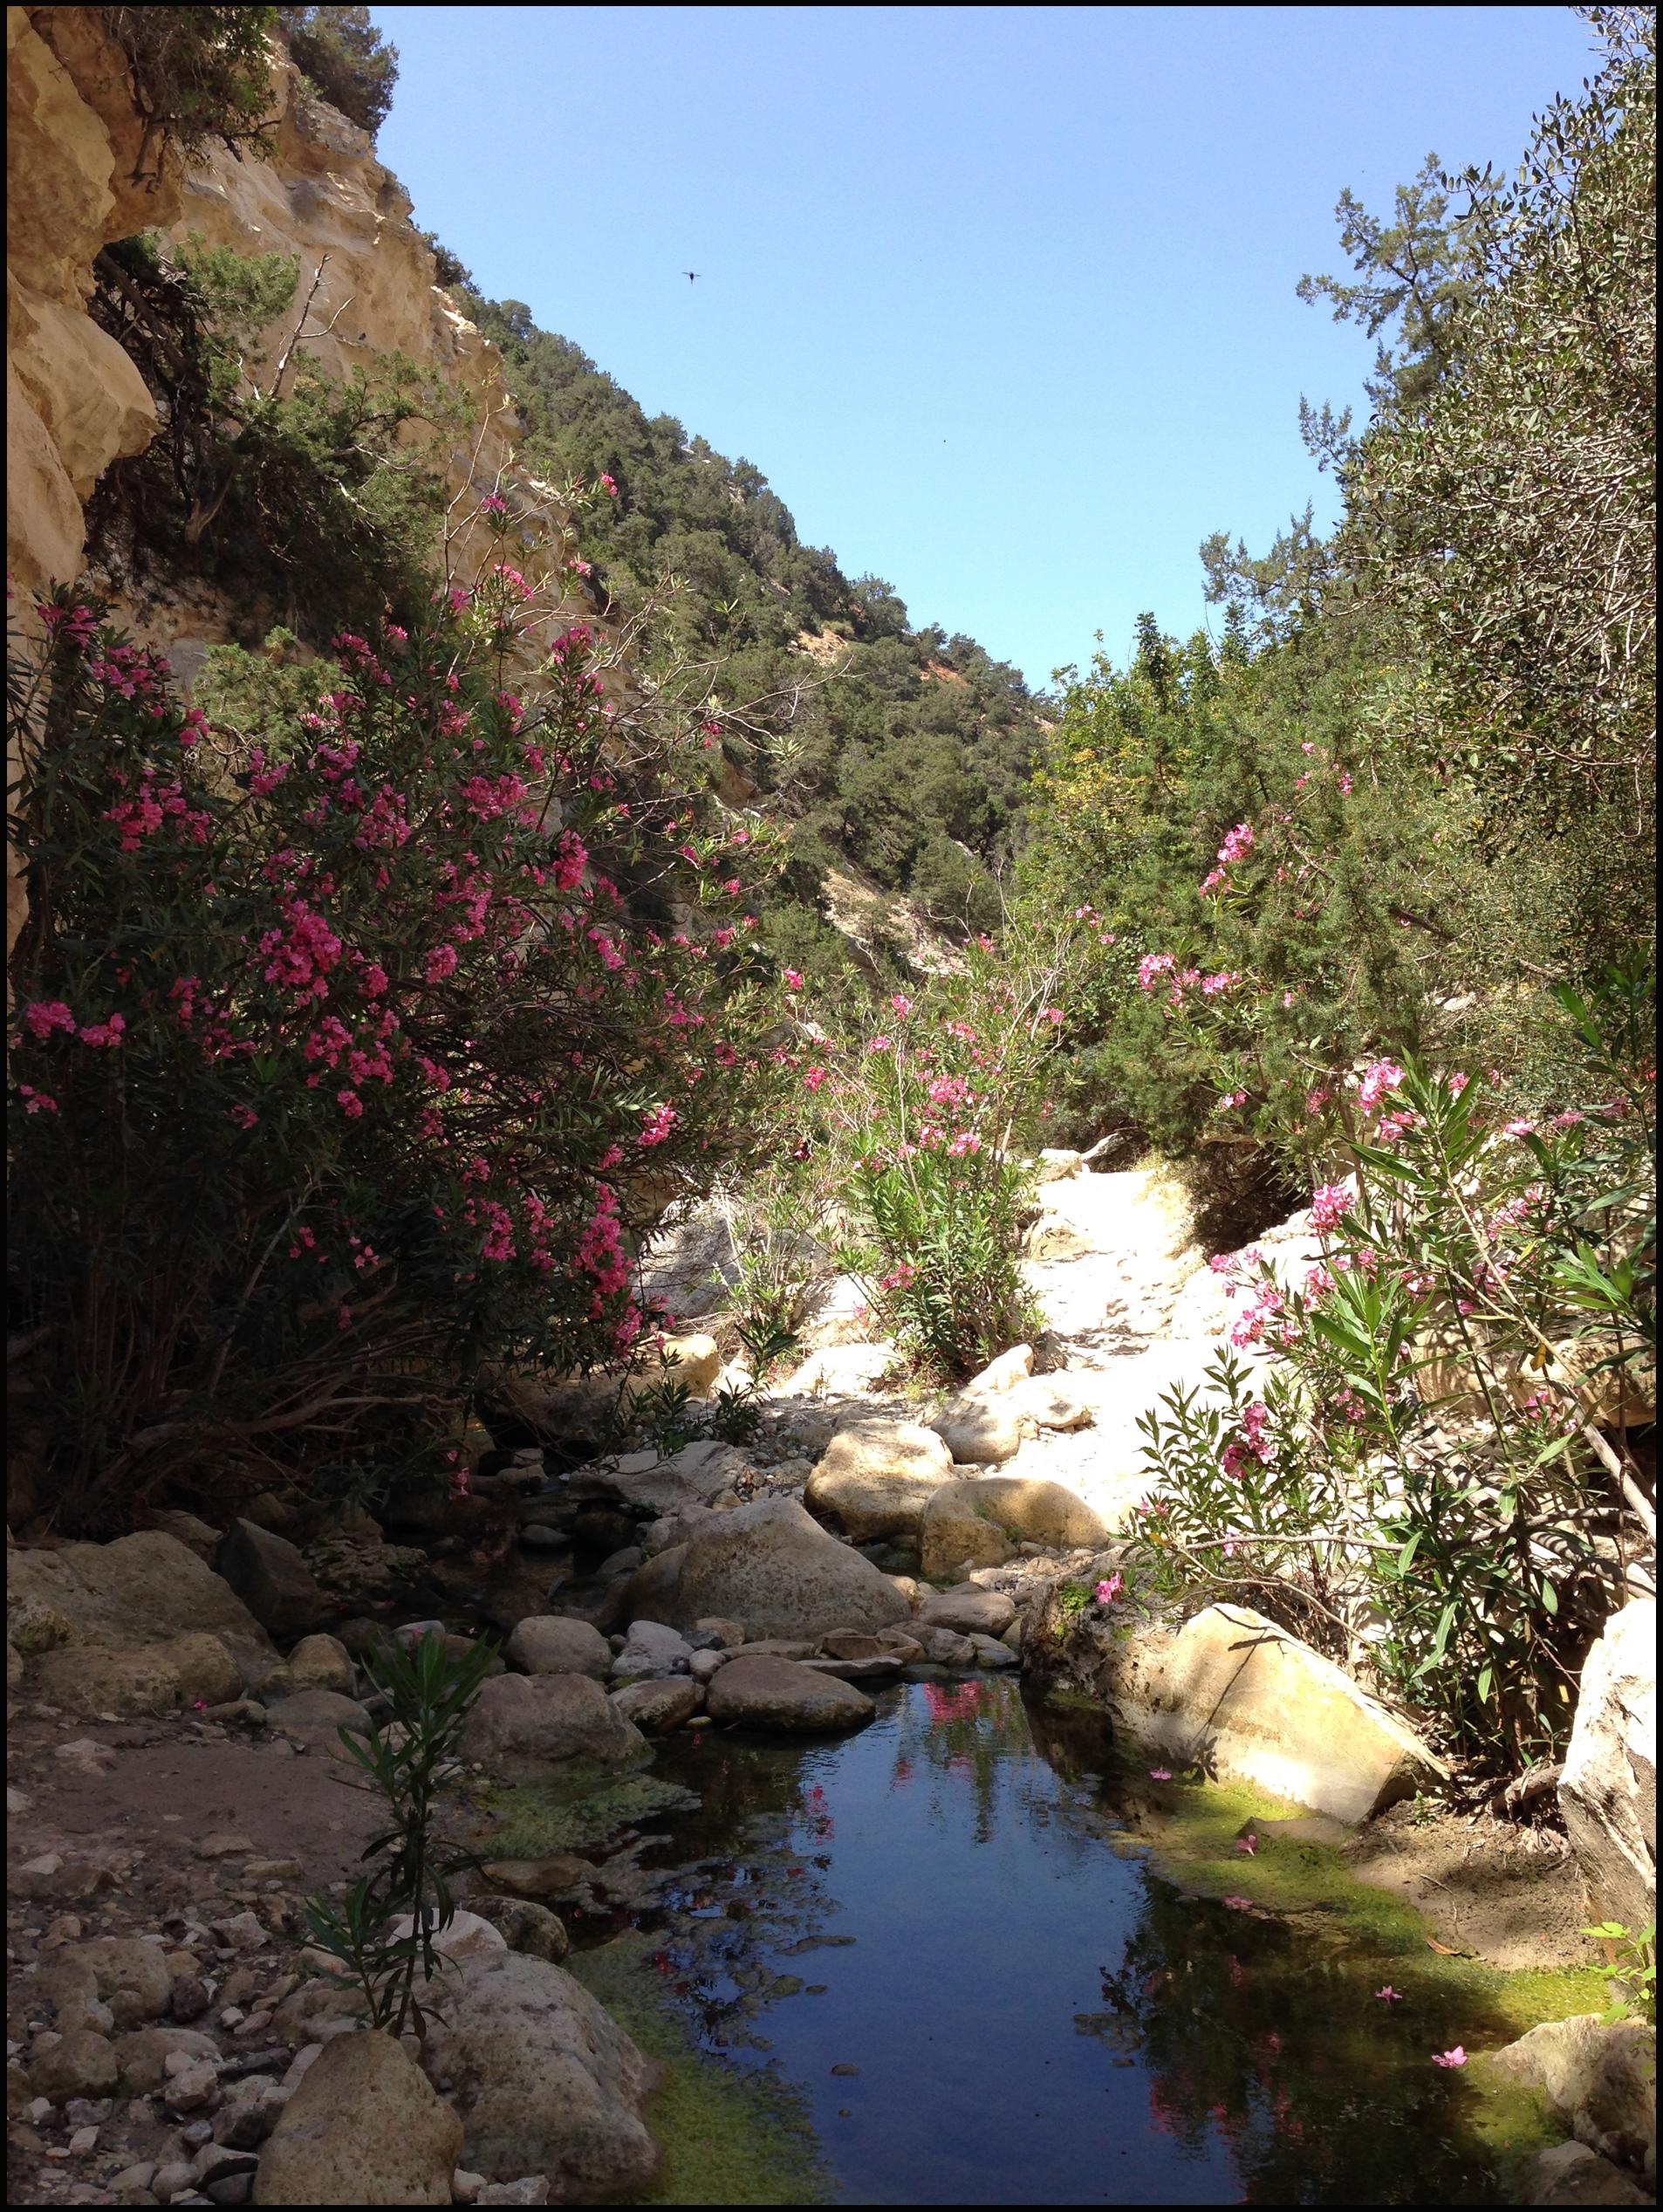 File:Кипр, ущелье Авакас - panoramio (5).jpg - Wikimedia ...